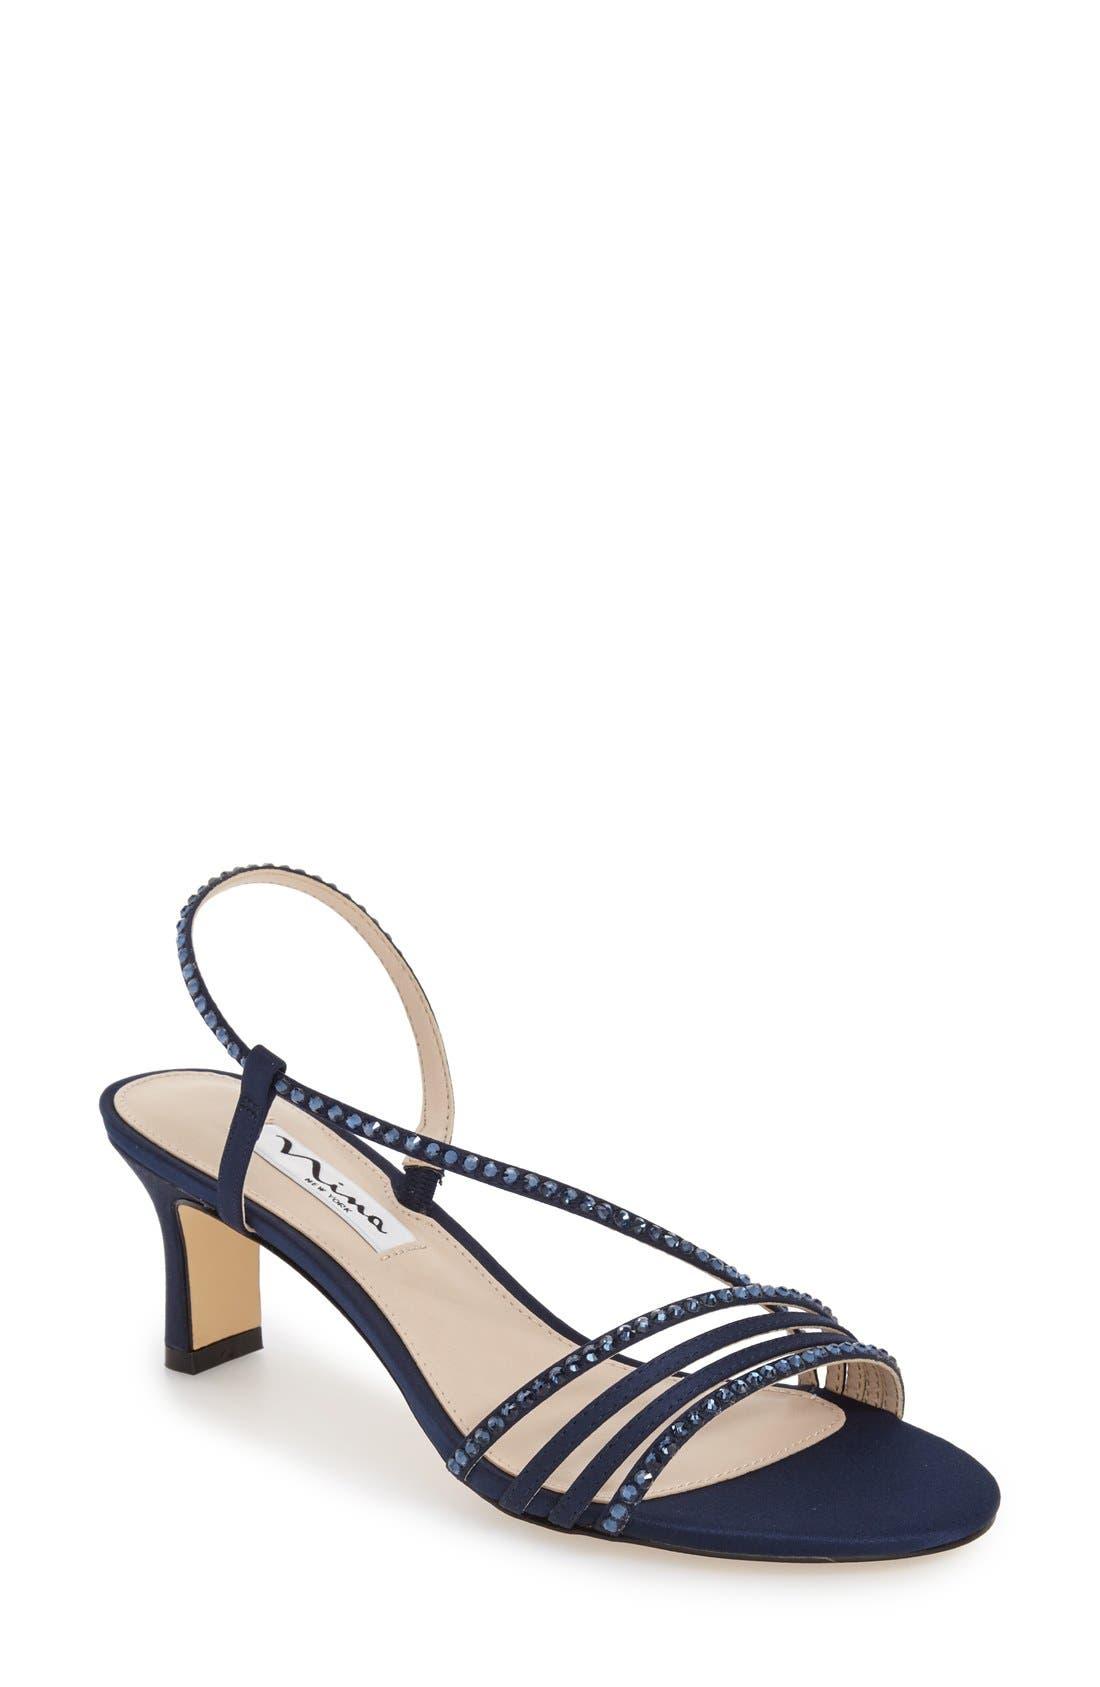 19f2c8a292c Nina  Gerri  Embellished Slingback Sandal